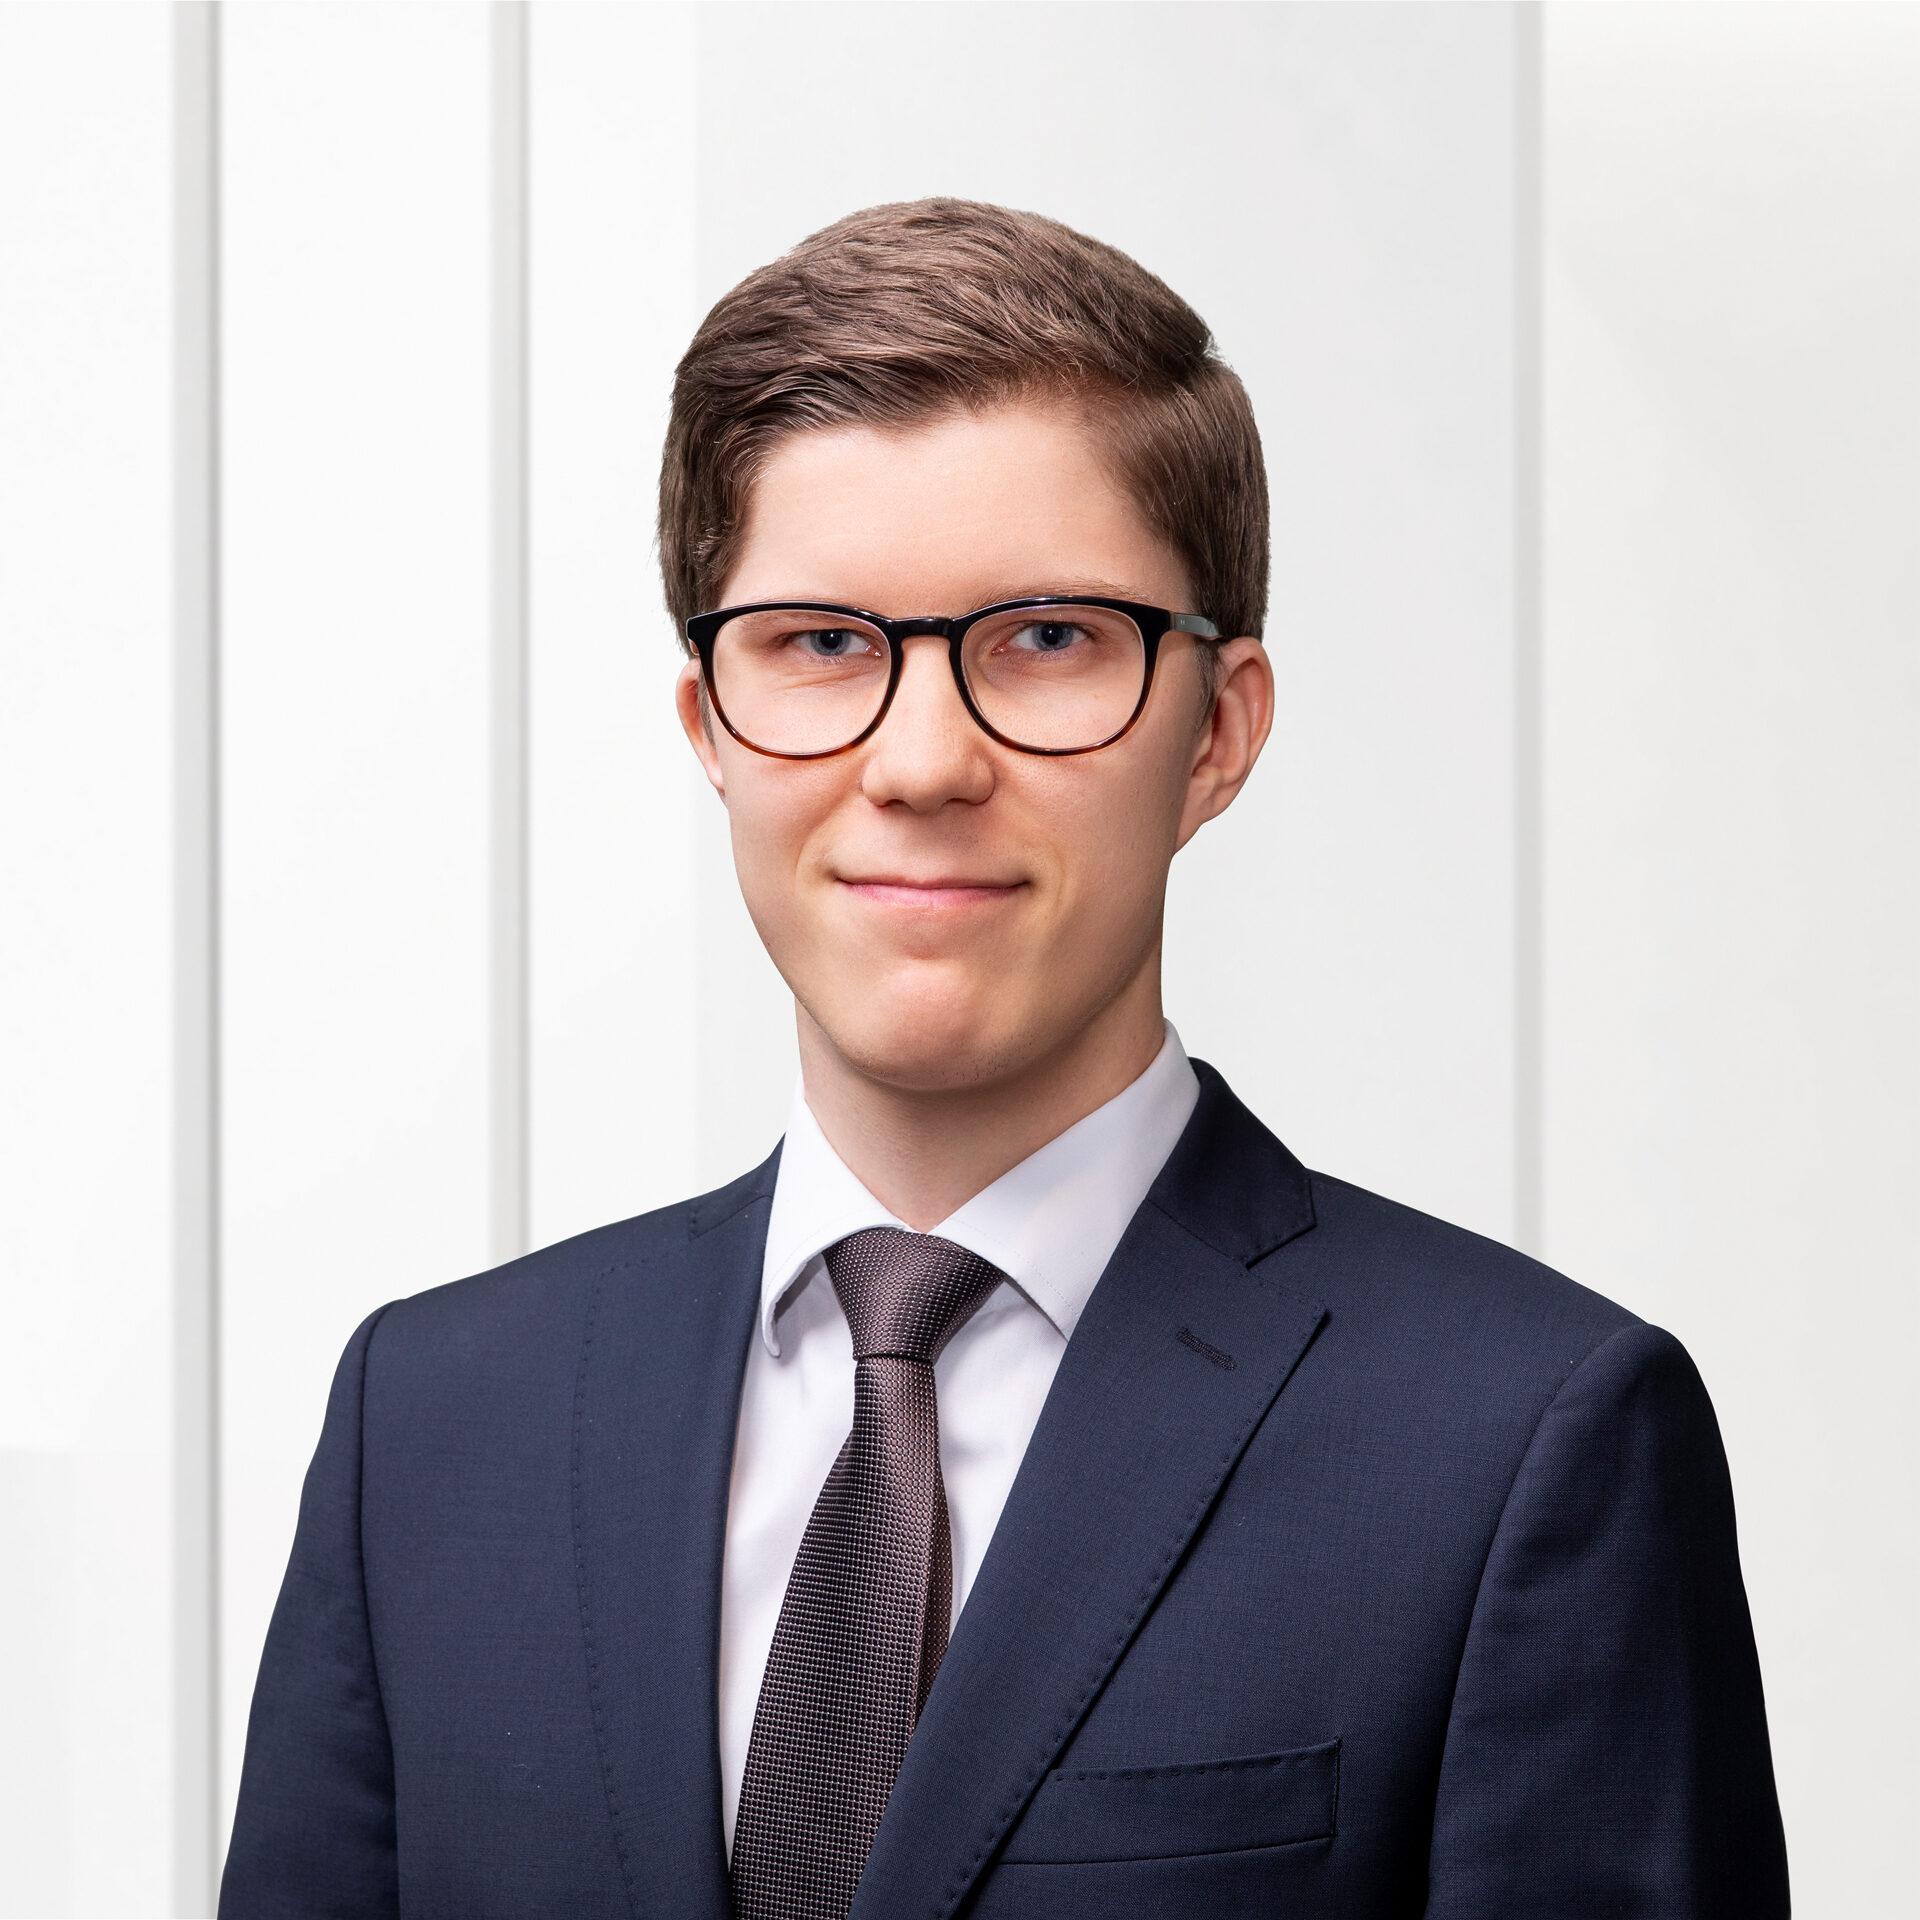 Photo of Anton Löwstedt